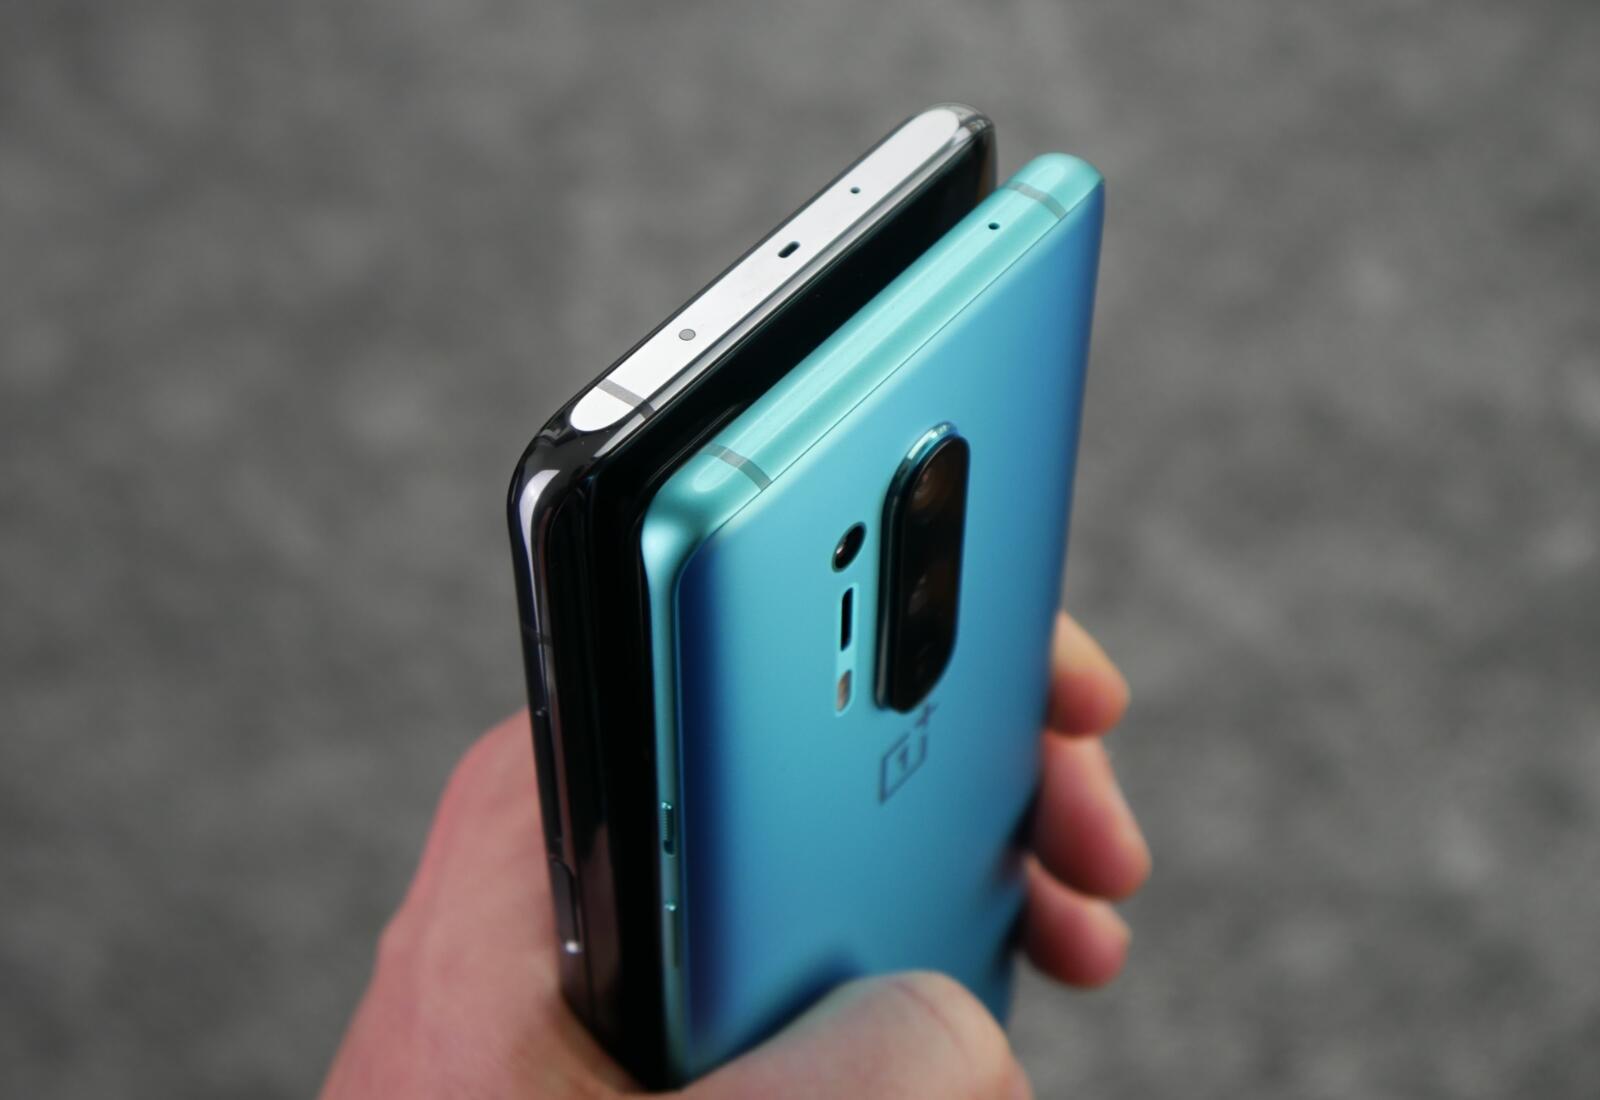 Oneplus 8 Pro Xiaomi Mi 10t Pro Top